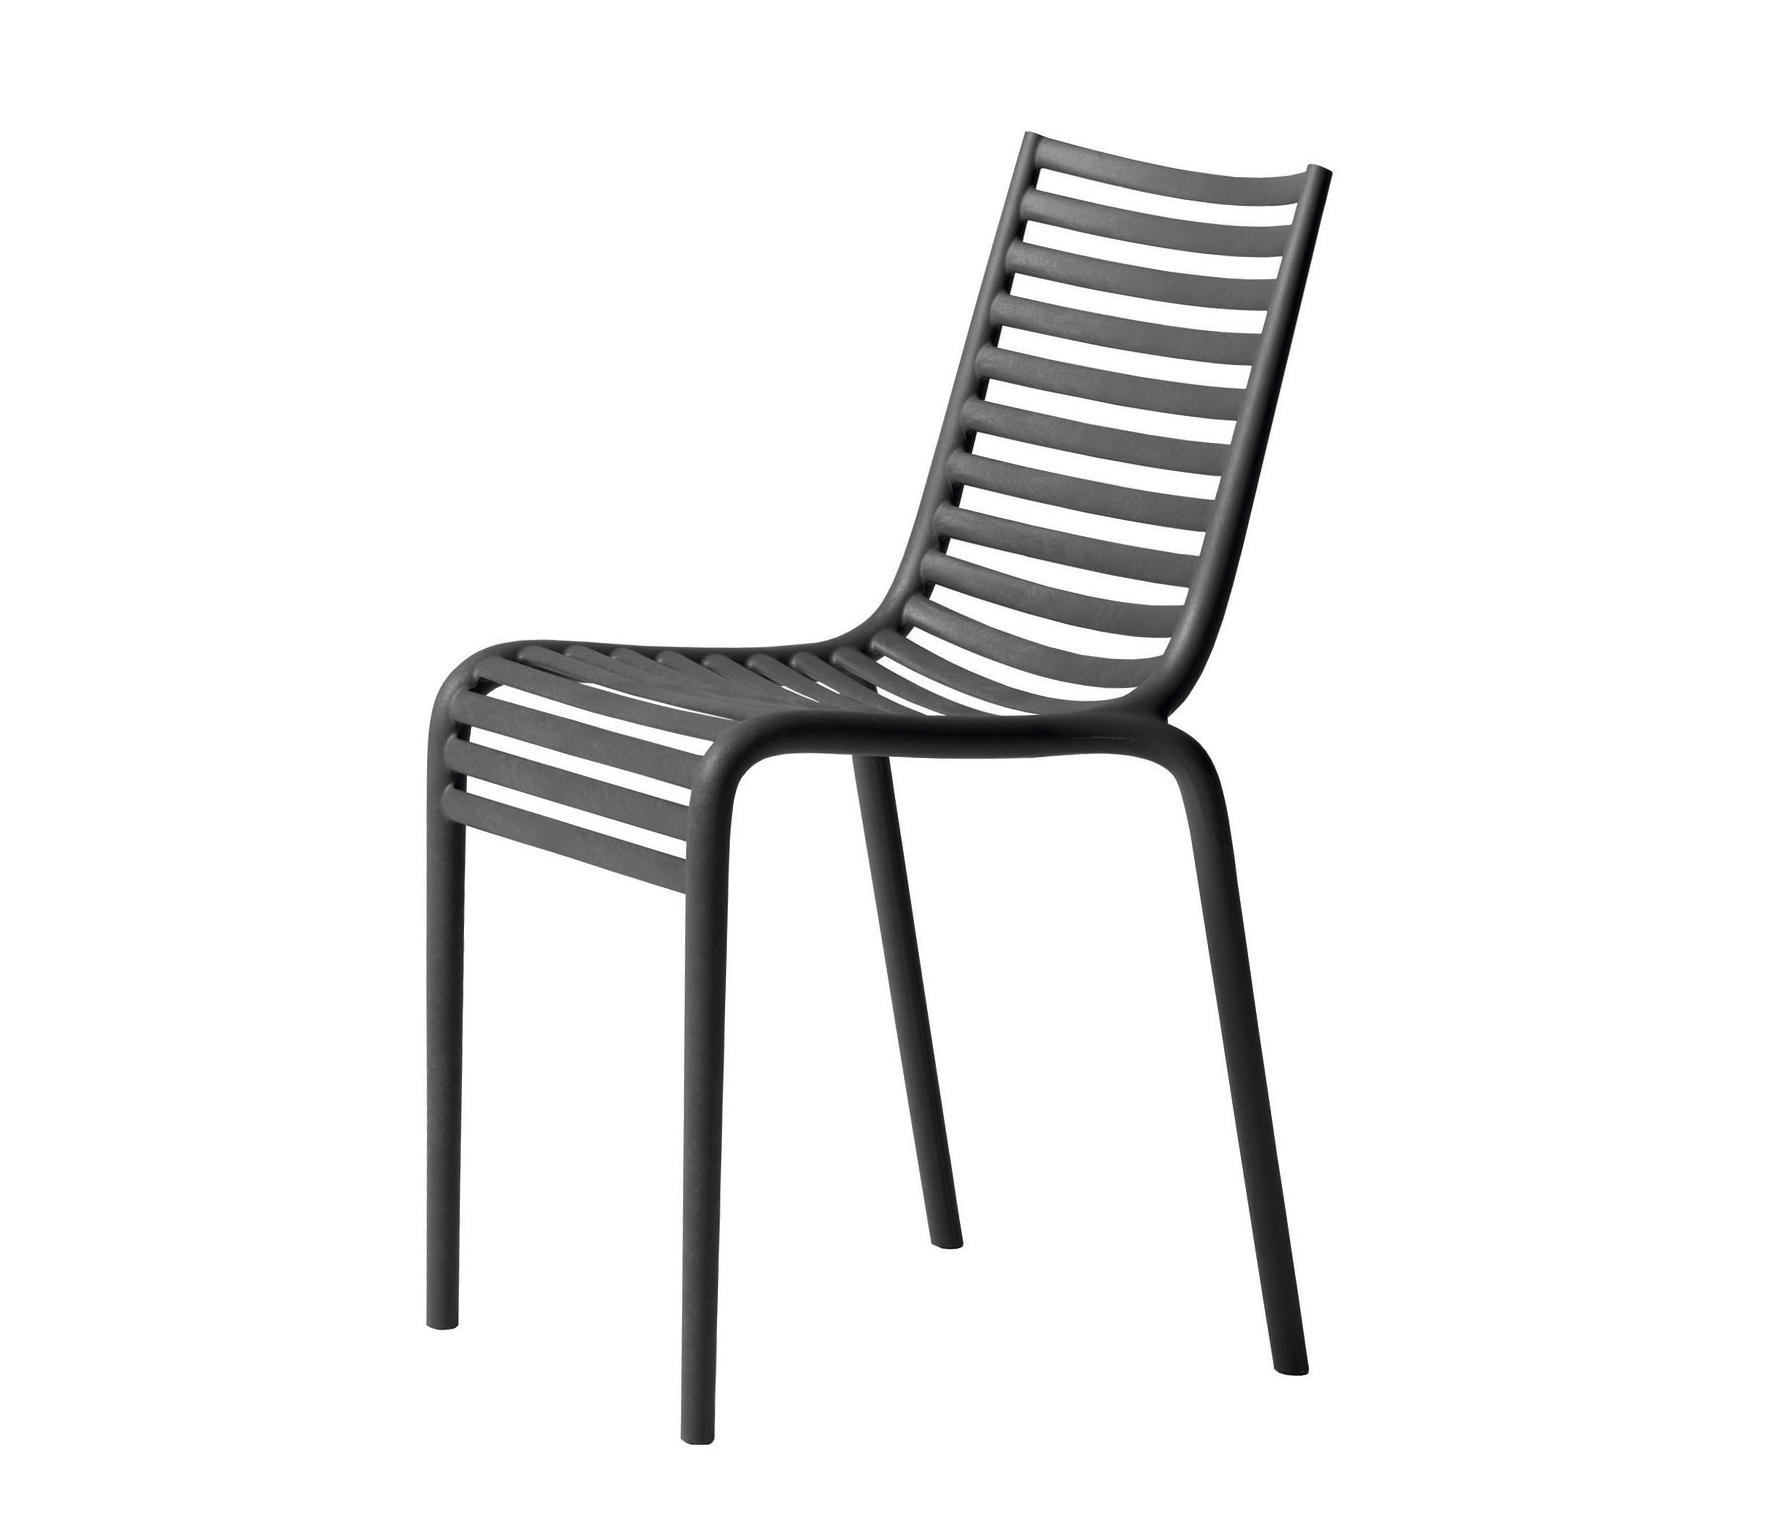 Pip e stackable chair by Driade